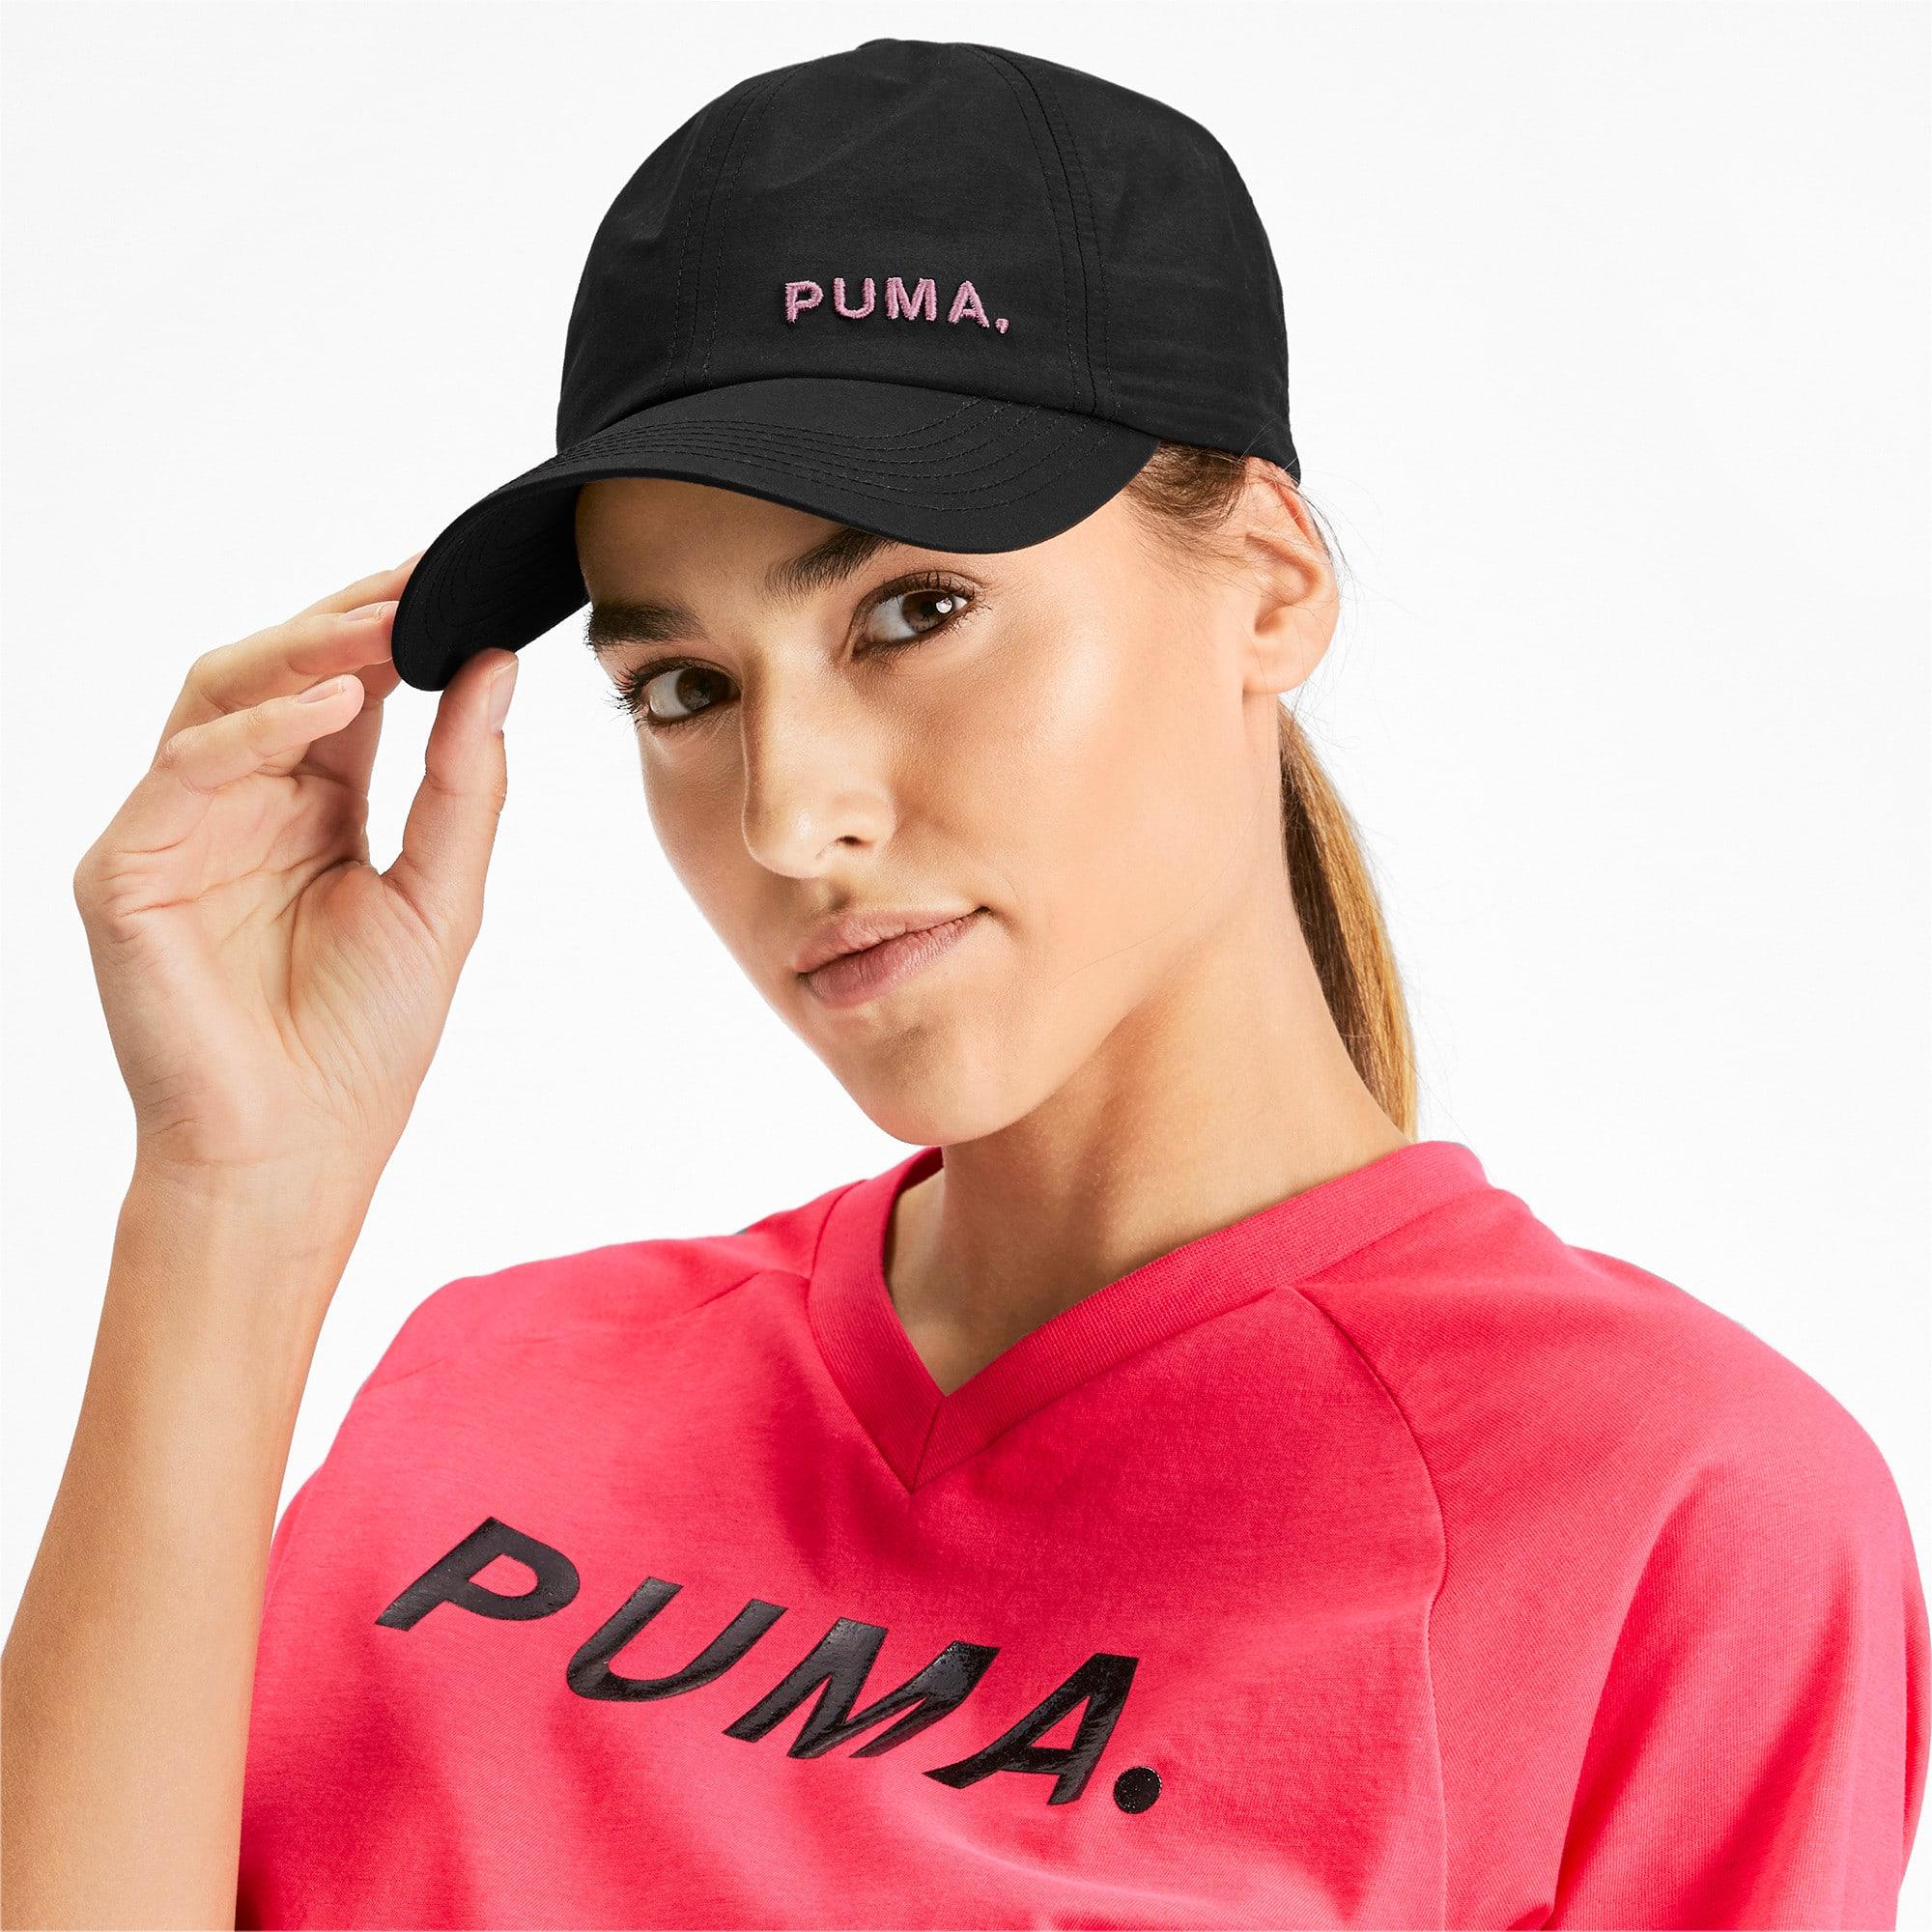 Thumbnail 2 of Shift Women's Cap, Puma Black-Bridal Rose, medium